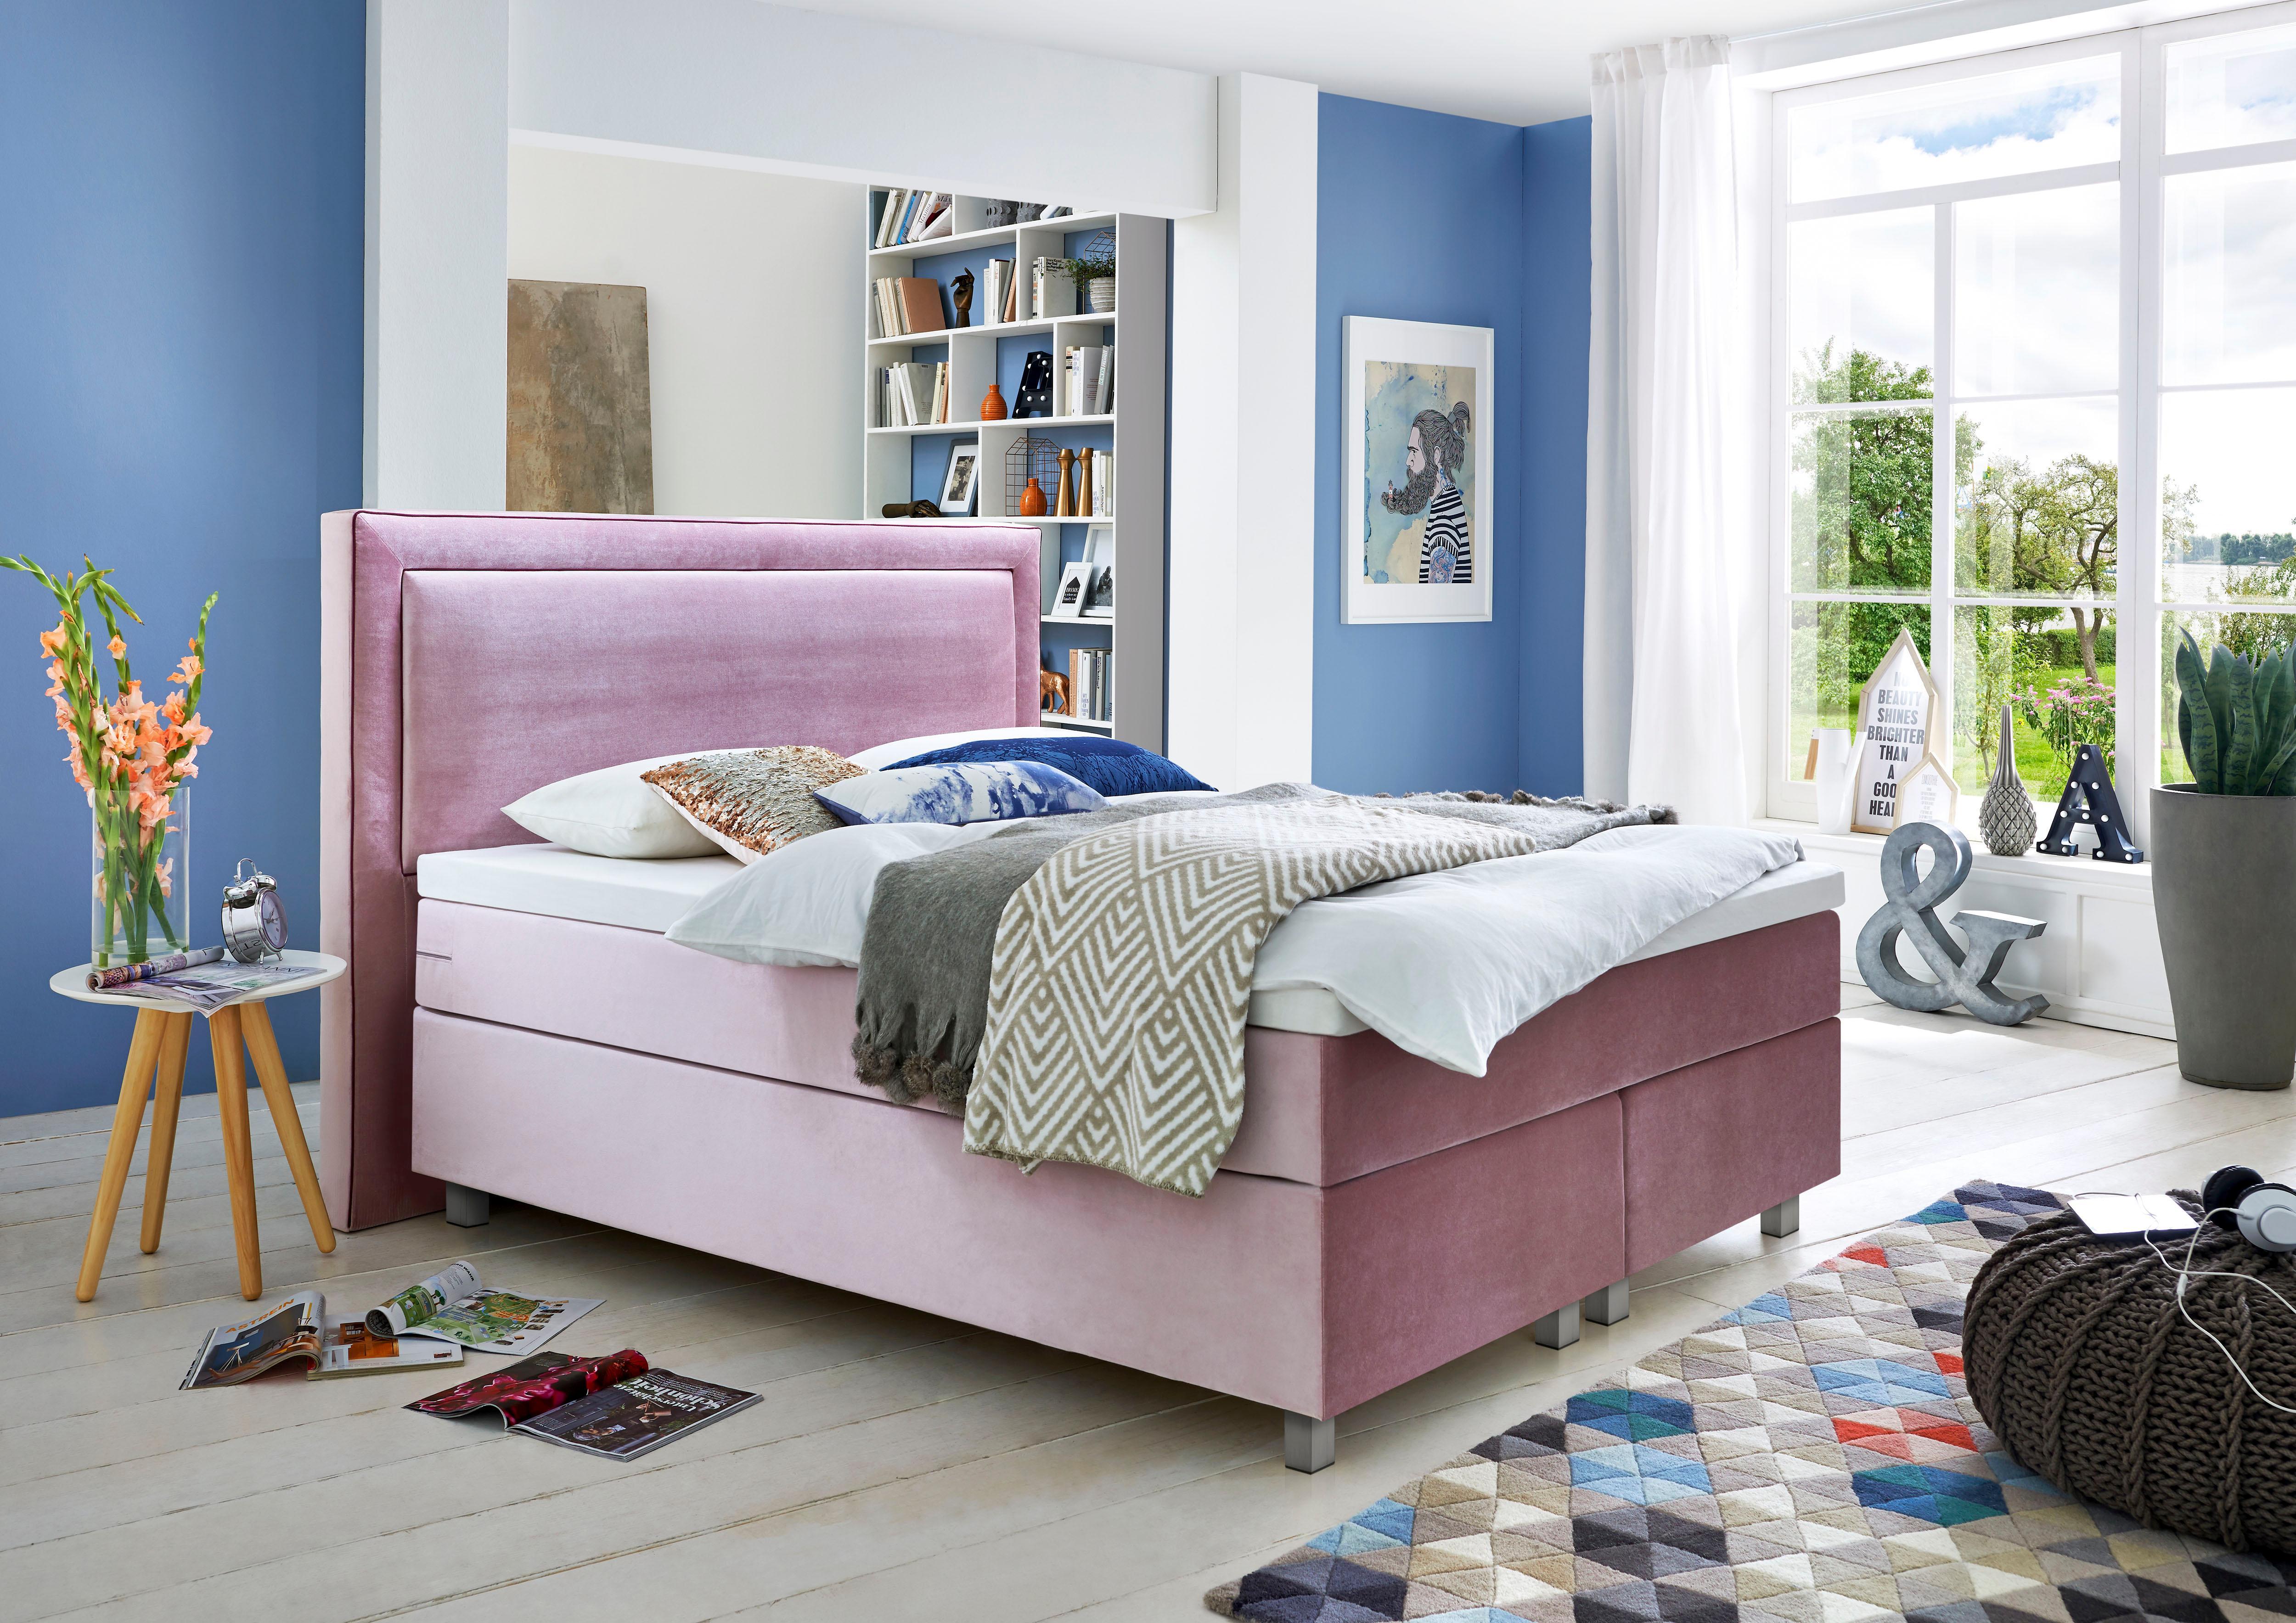 GMK Home & Living Boxspringbett mit Komfortschaum-Topper